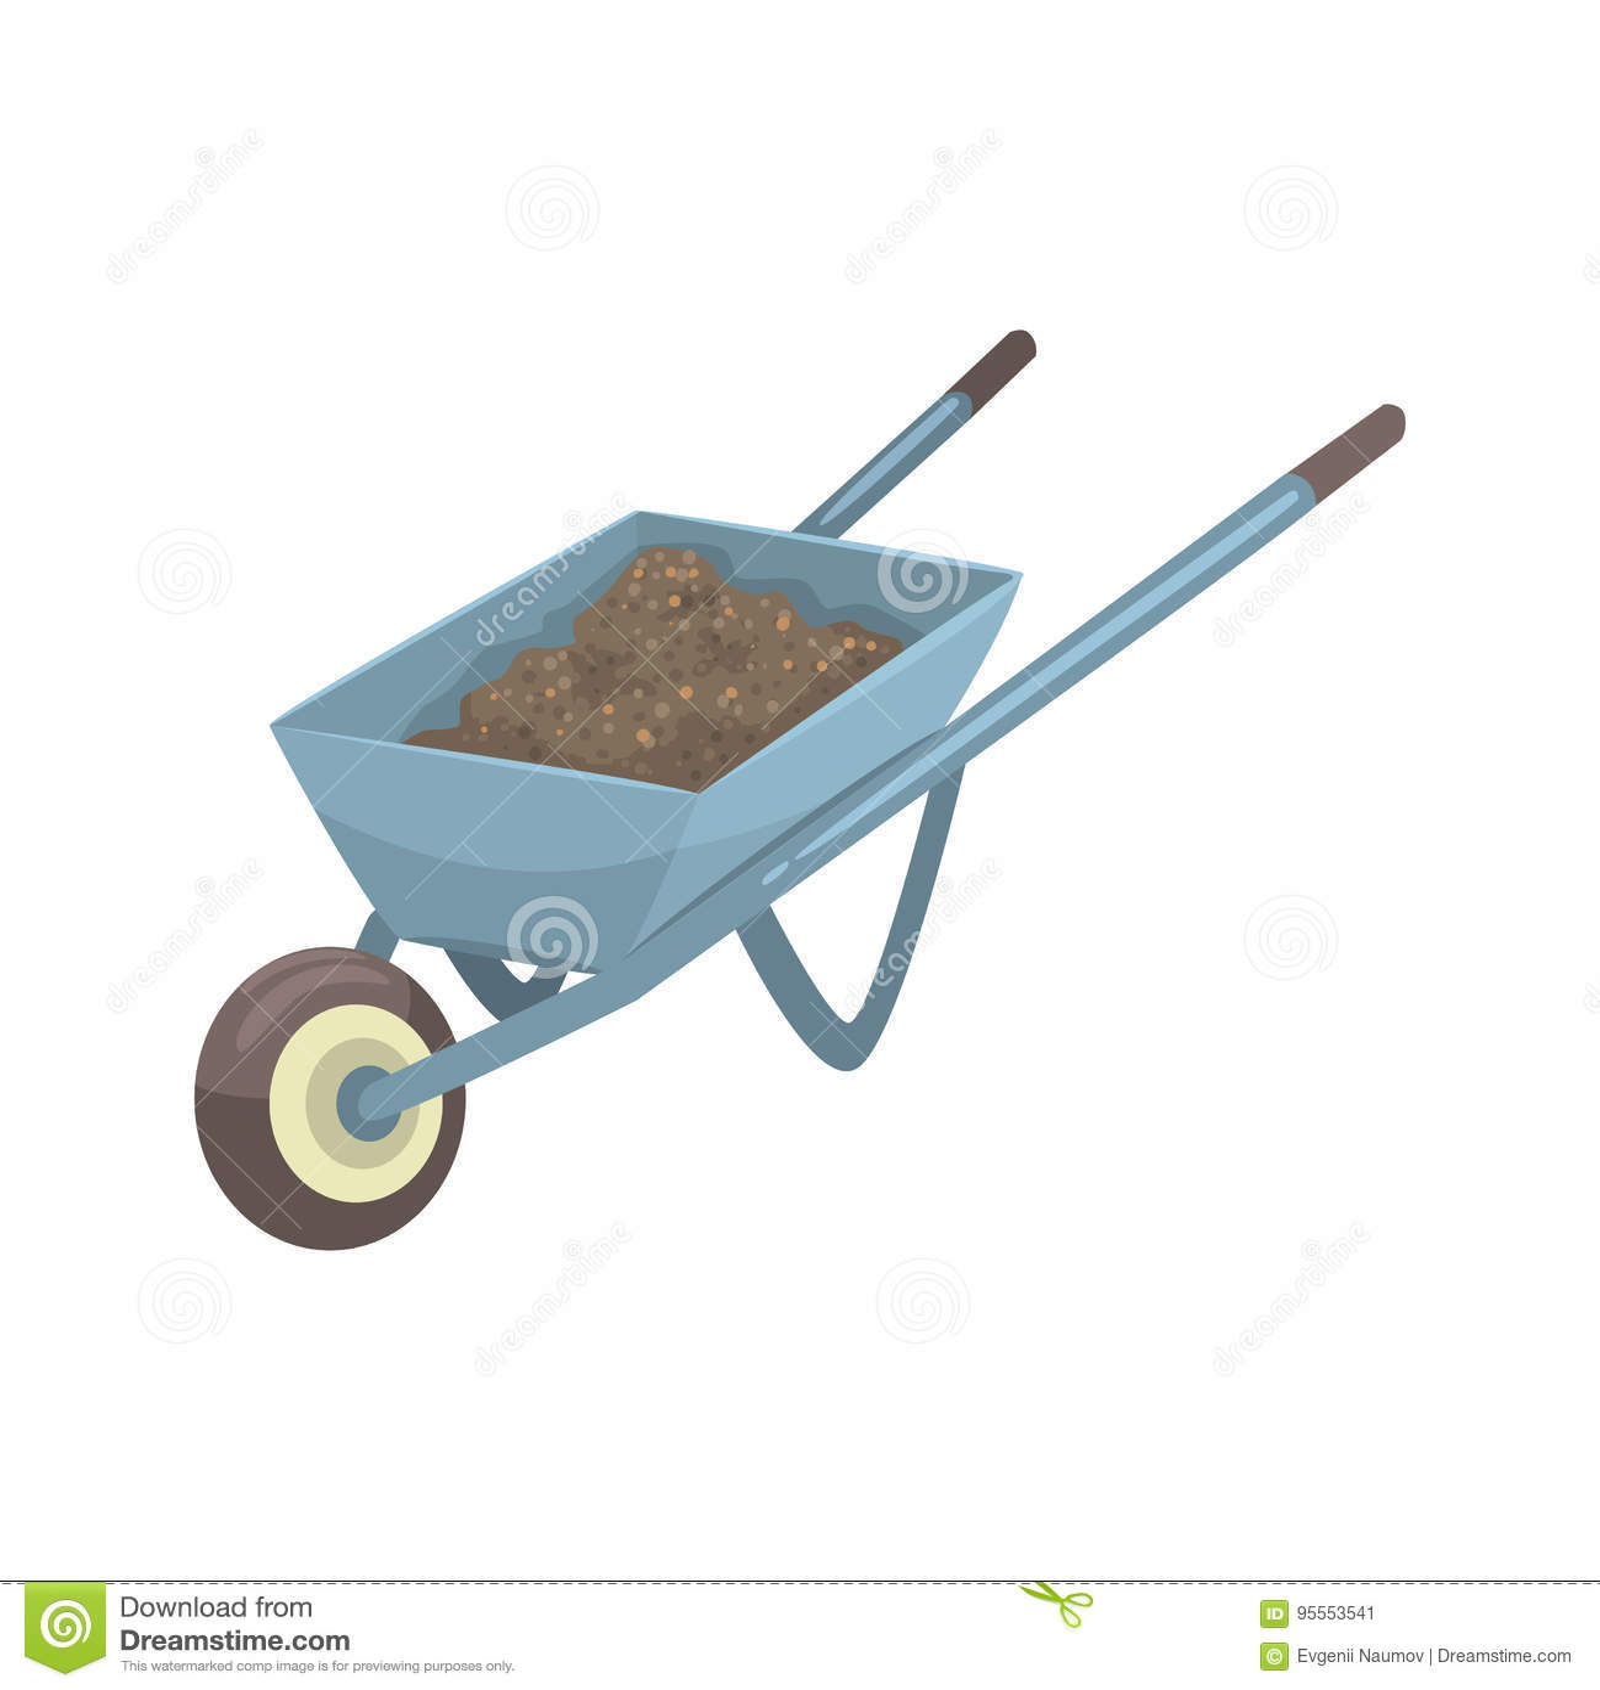 Wheelbarrow σύνολο της διανυσματικής απεικόνισης κινούμενων σχεδίων χώματος ή λιπάσματος